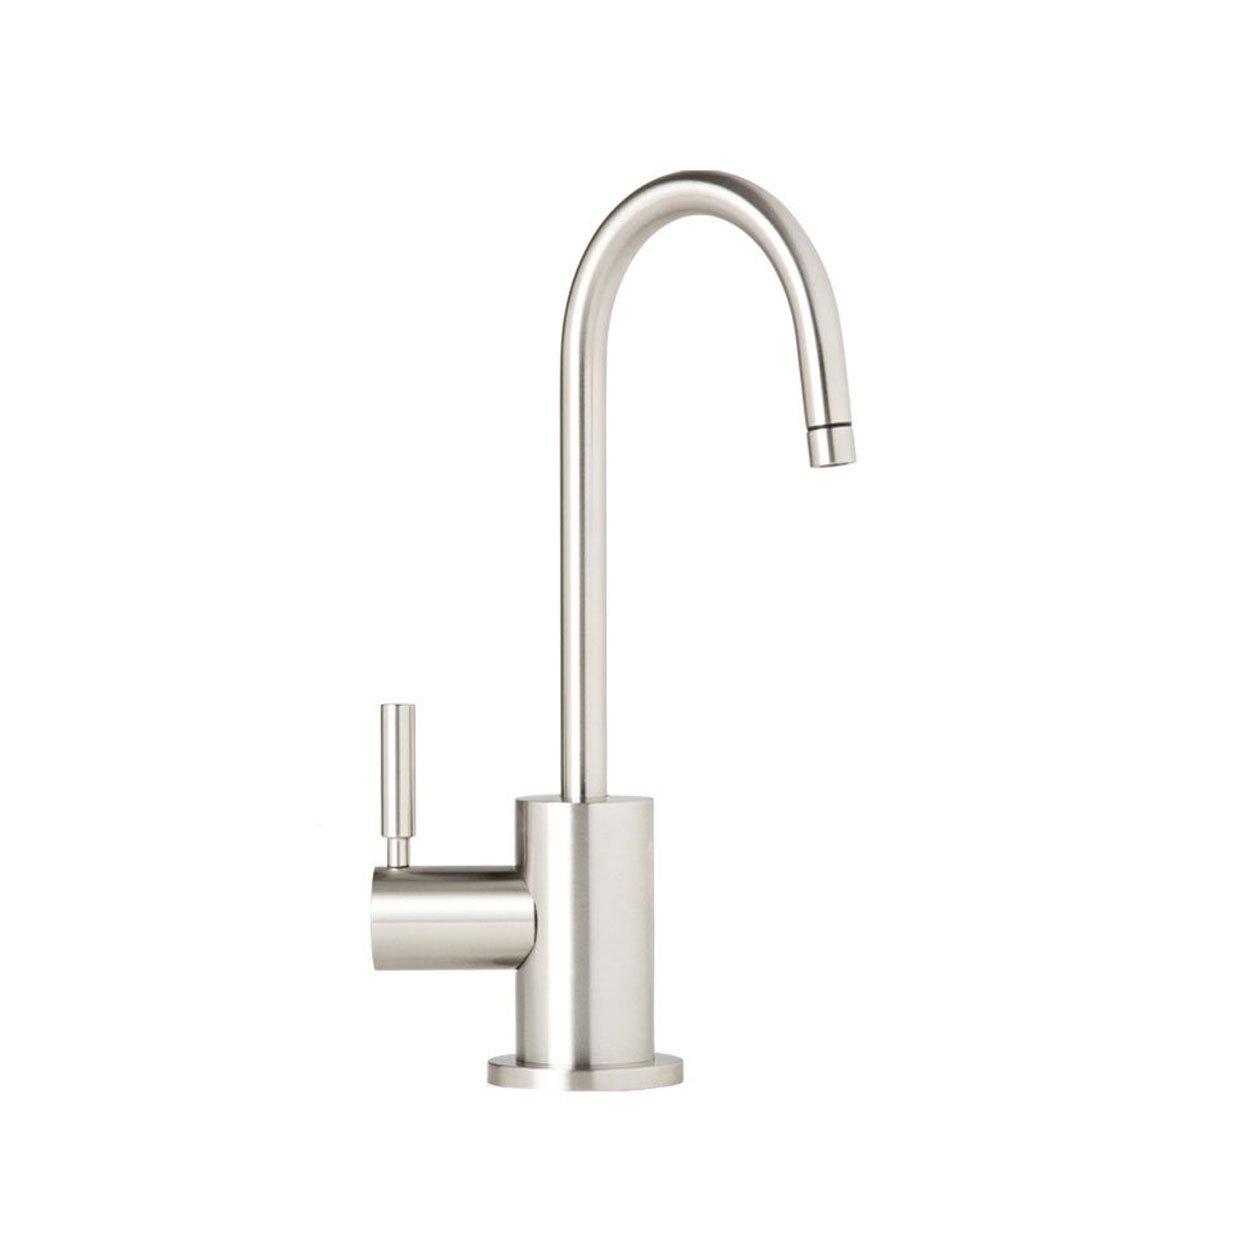 Waterstone 1400C-CH Parche Filtration Faucet Cold Only Single Handle, Chrome